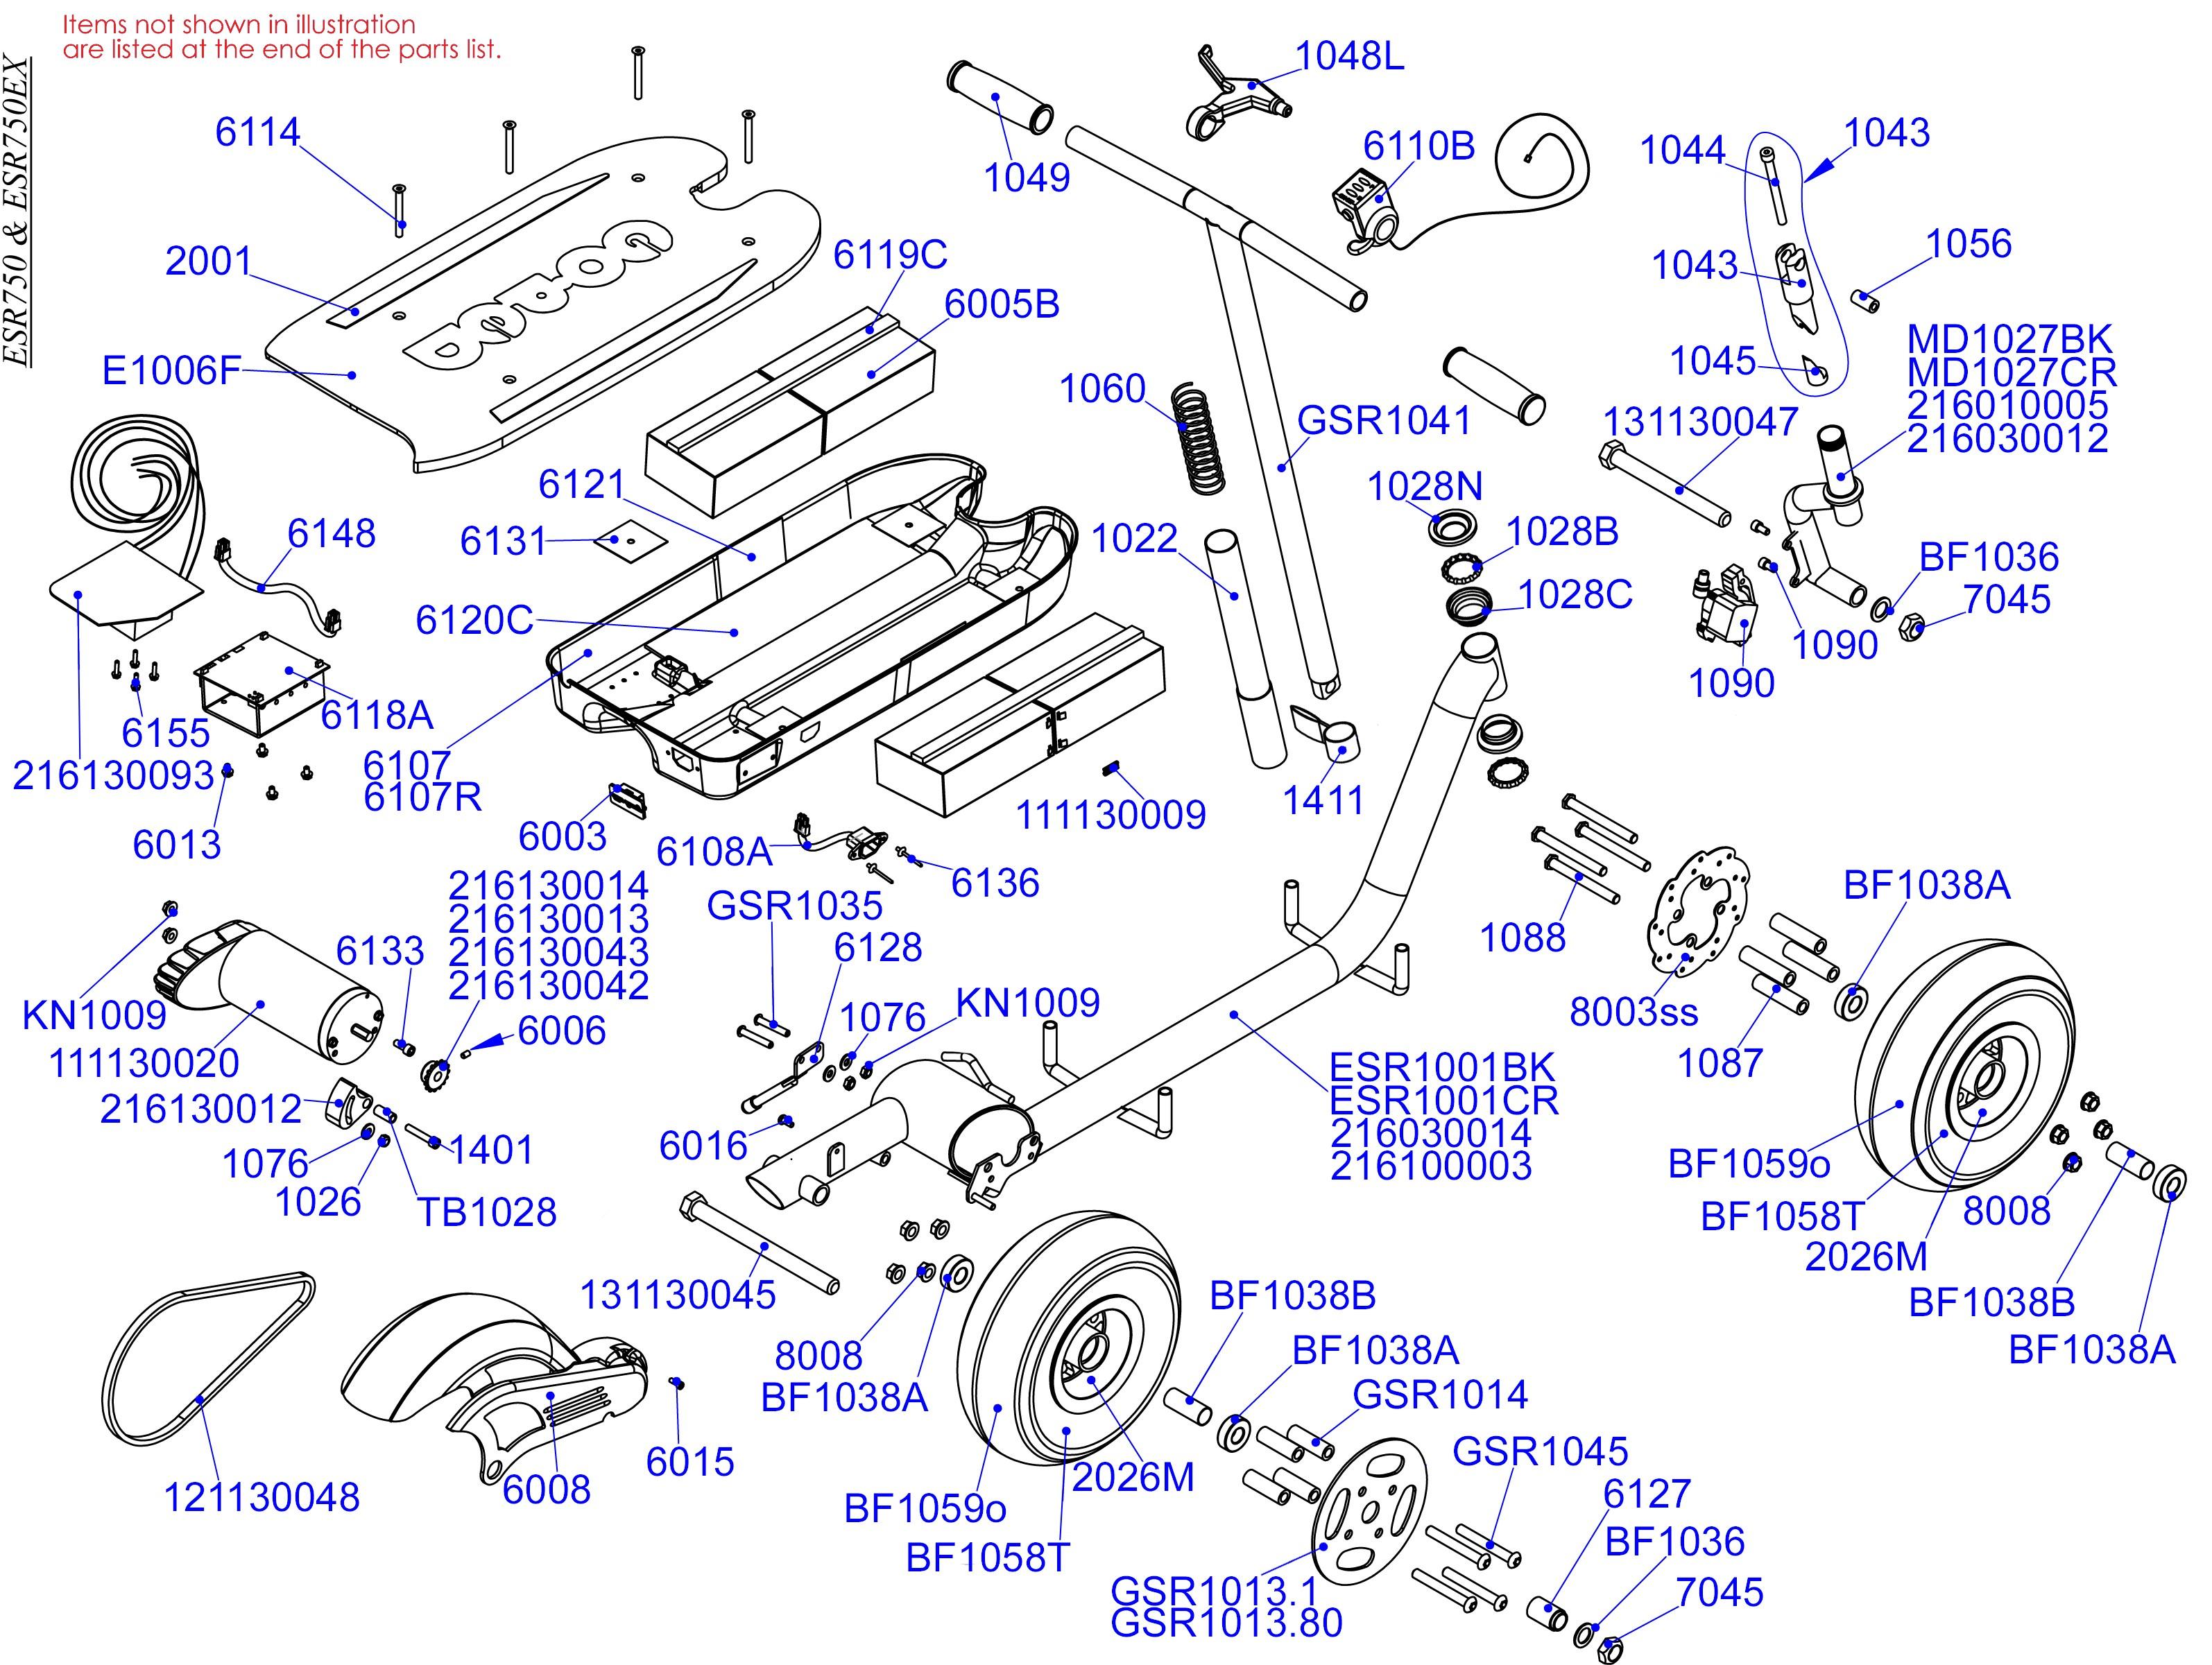 Electric Motor Parts Diagram Parts Electric Scooter Parts Esr 750 Of Electric Motor Parts Diagram